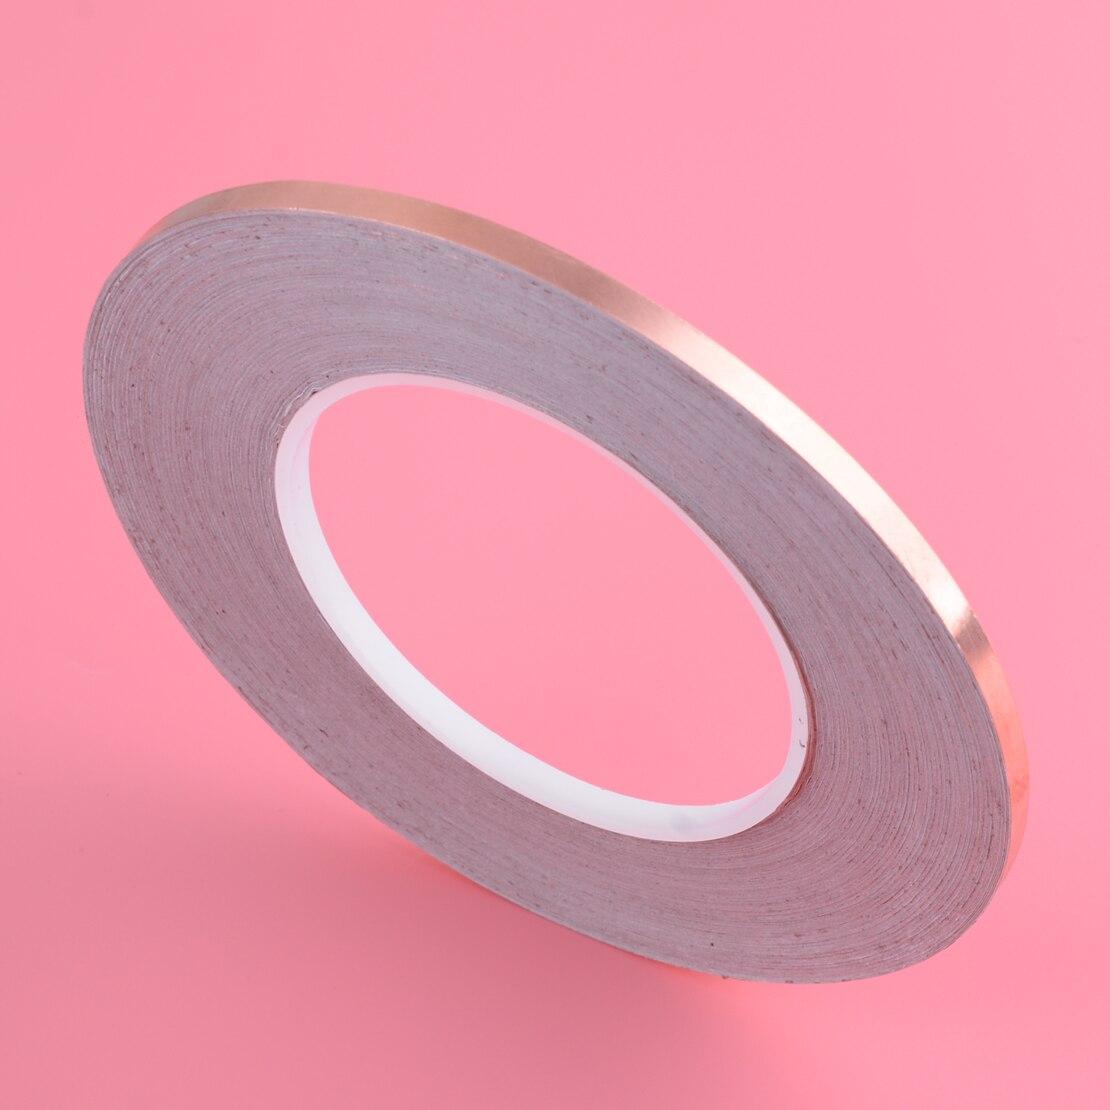 50M 5mm Single Side Conductive Copper Foil Tape Adhesive Shield Heat Resist Computer Peripheral Wire